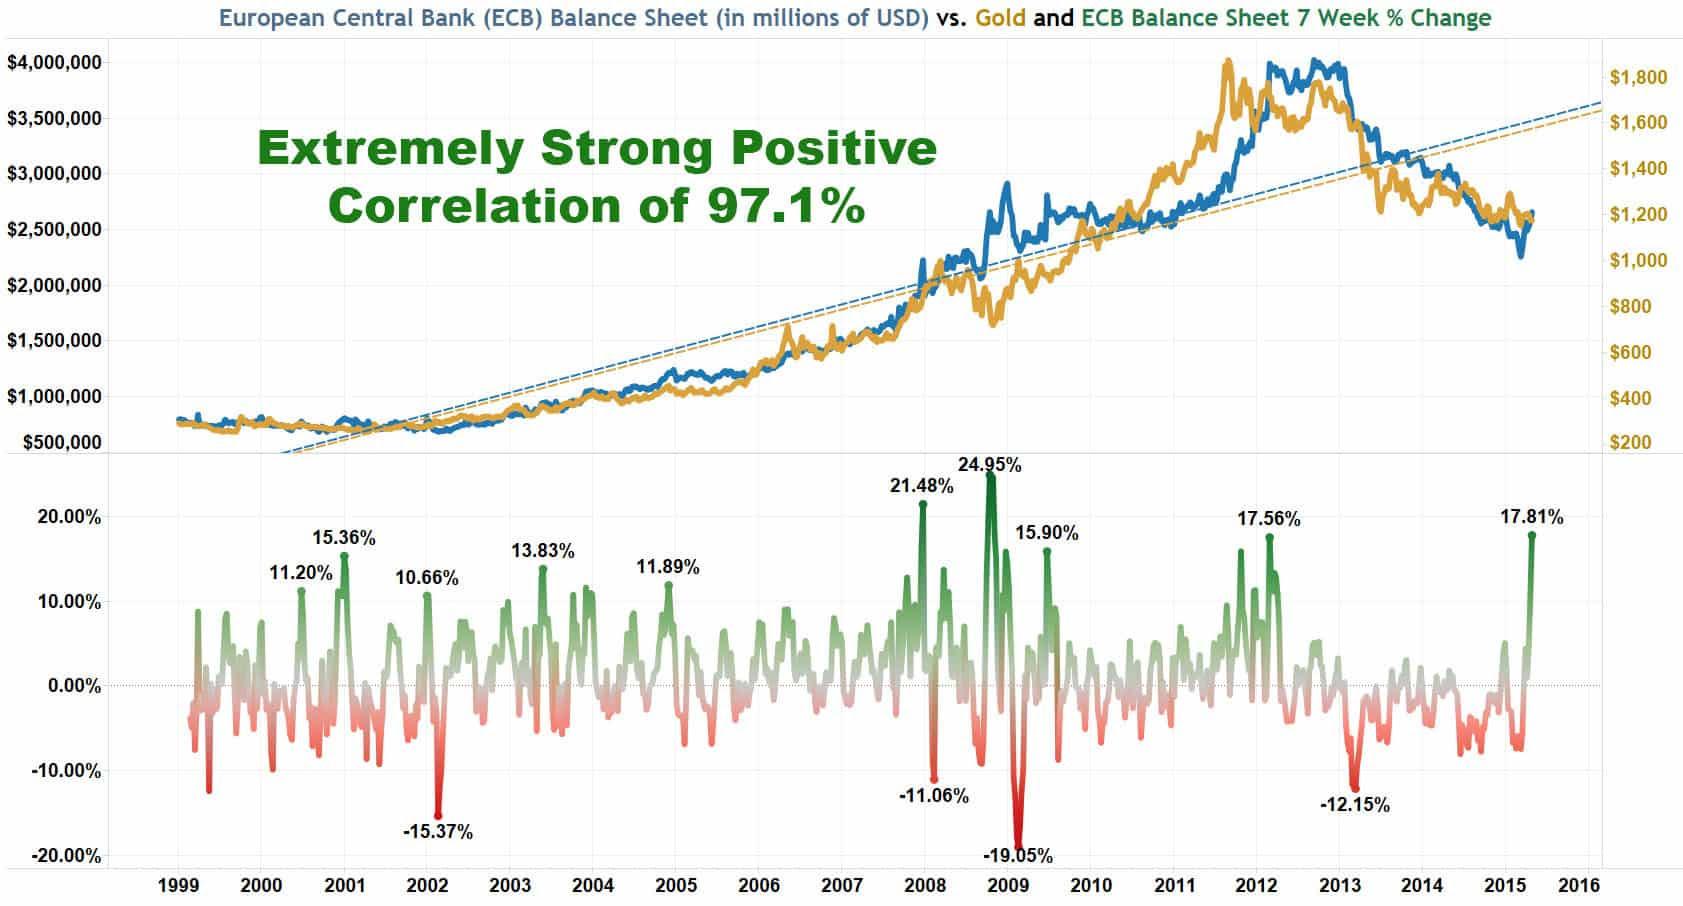 ECB Balance Sheet Versus Gold